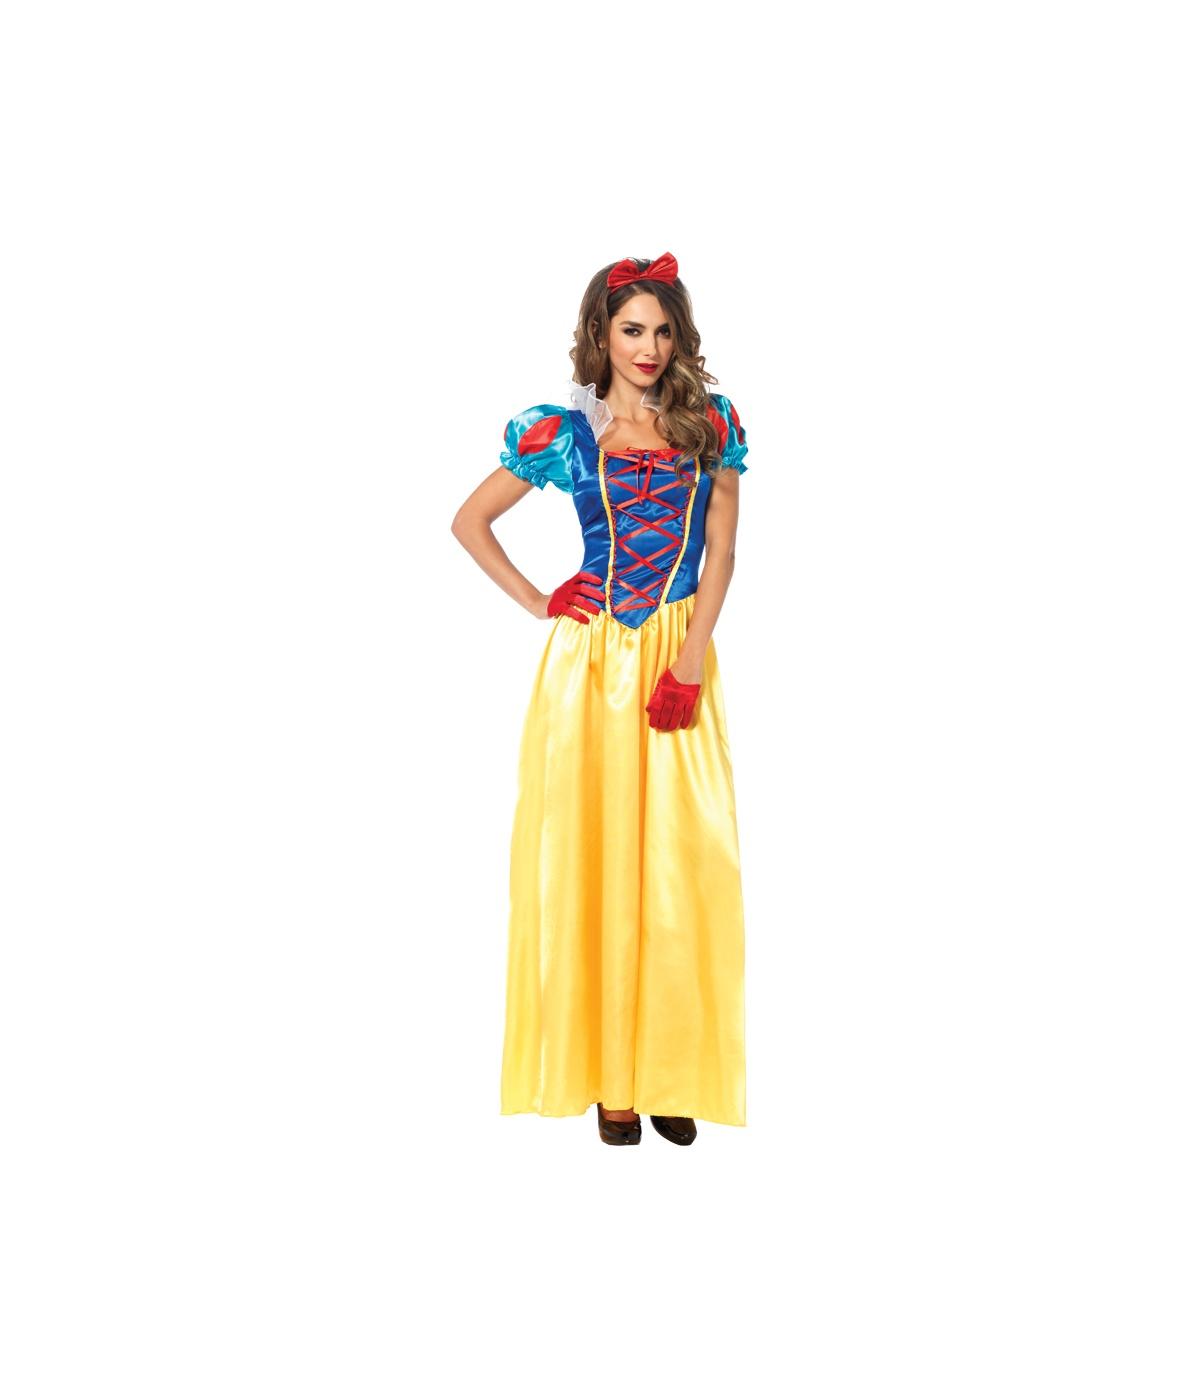 original snow white womens costume disney costumes. Black Bedroom Furniture Sets. Home Design Ideas